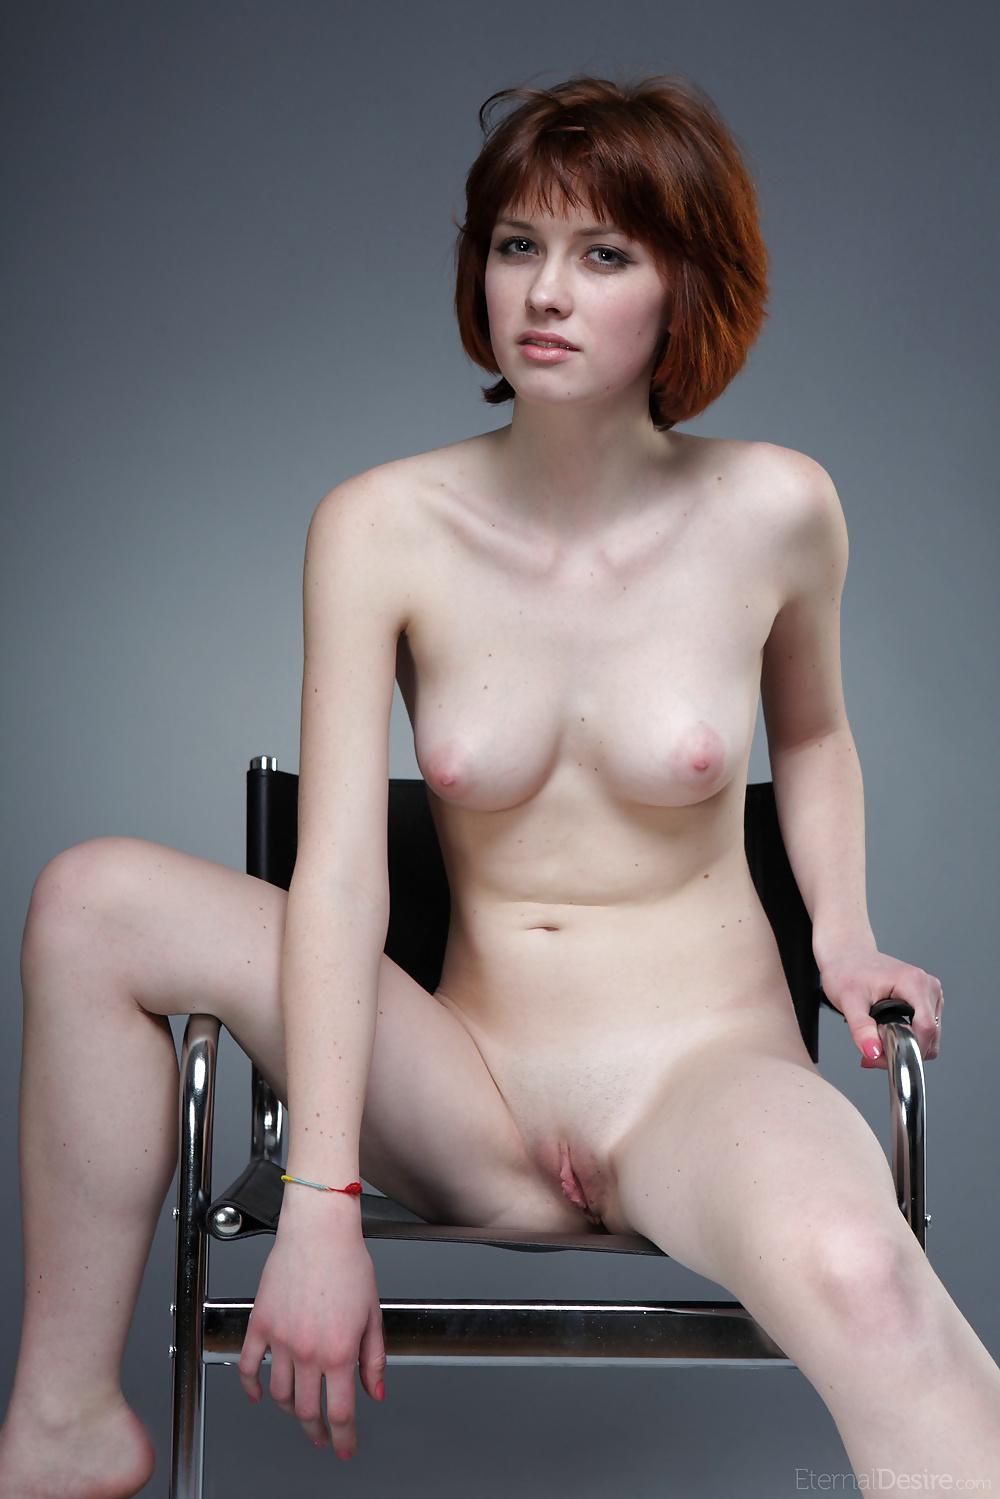 Porn girl hair cut — img 5